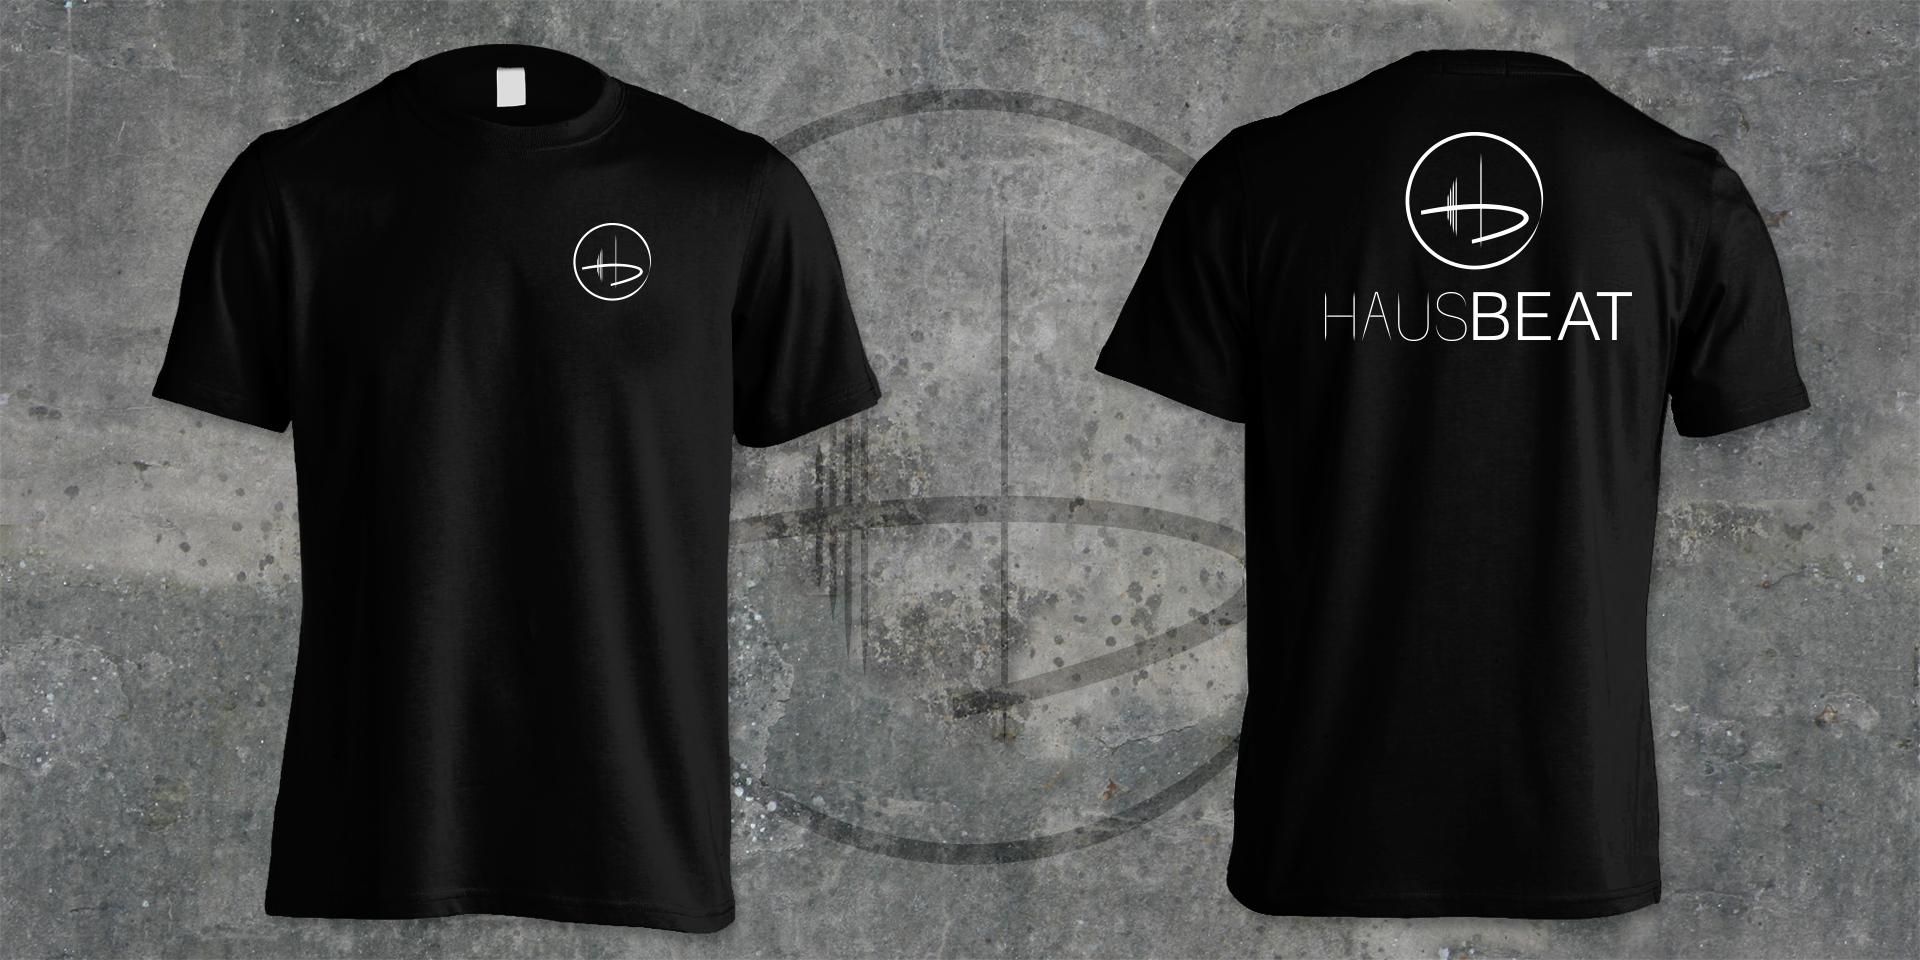 hauseat-tshirt-by-funky-b